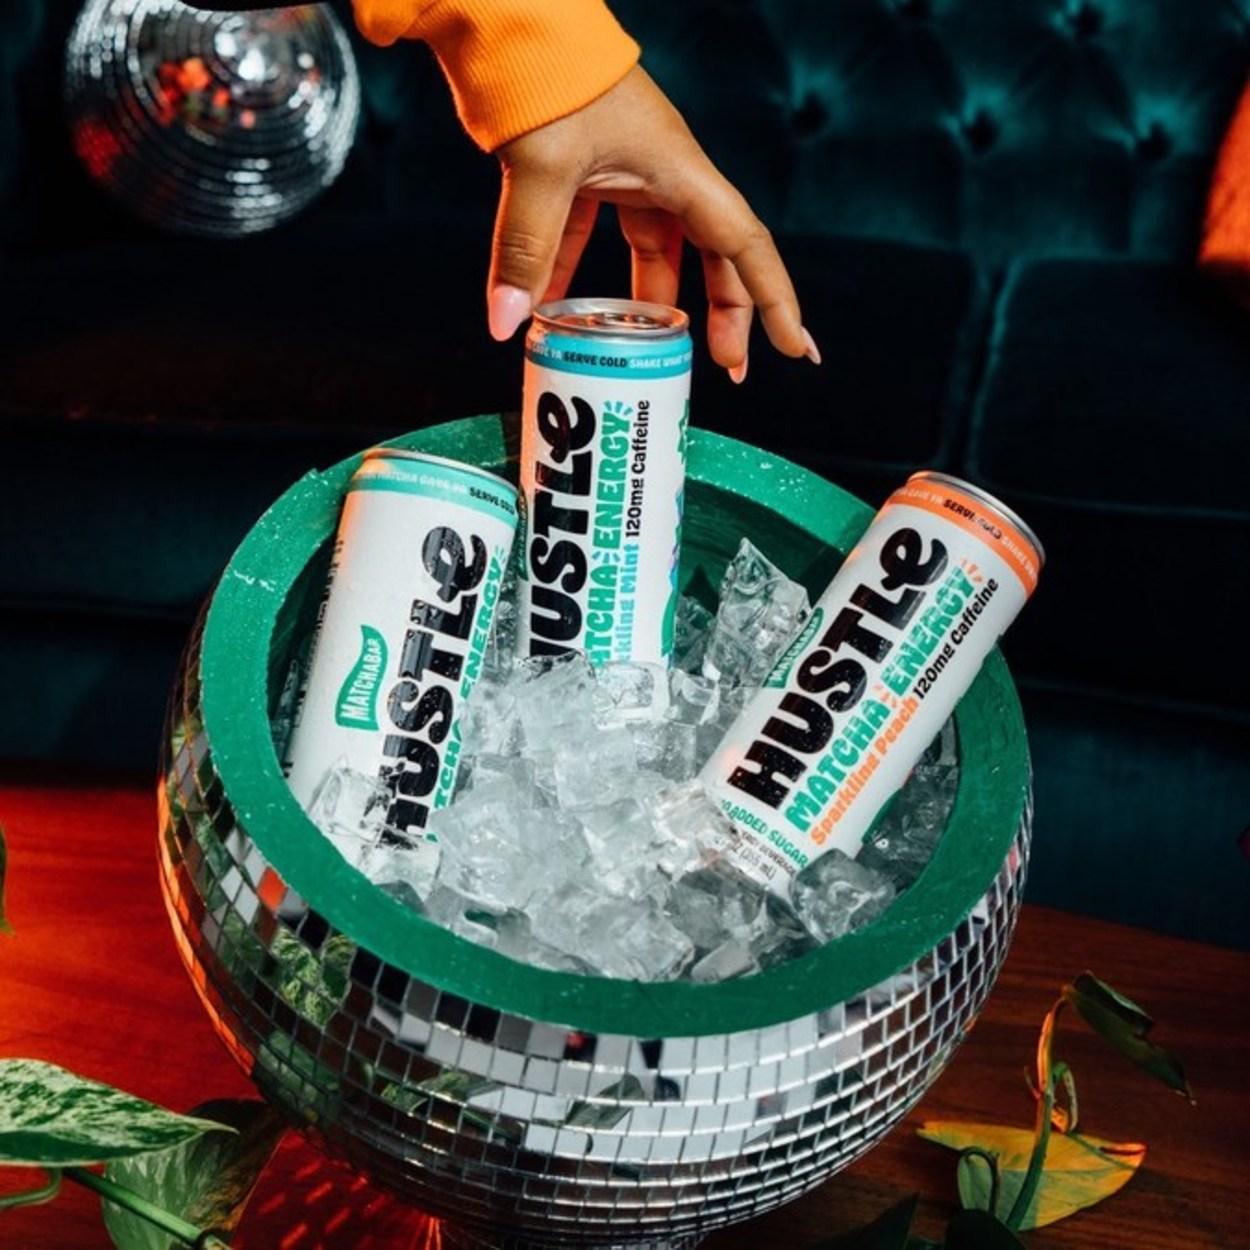 MatchaBar Hustle Energy Drink.